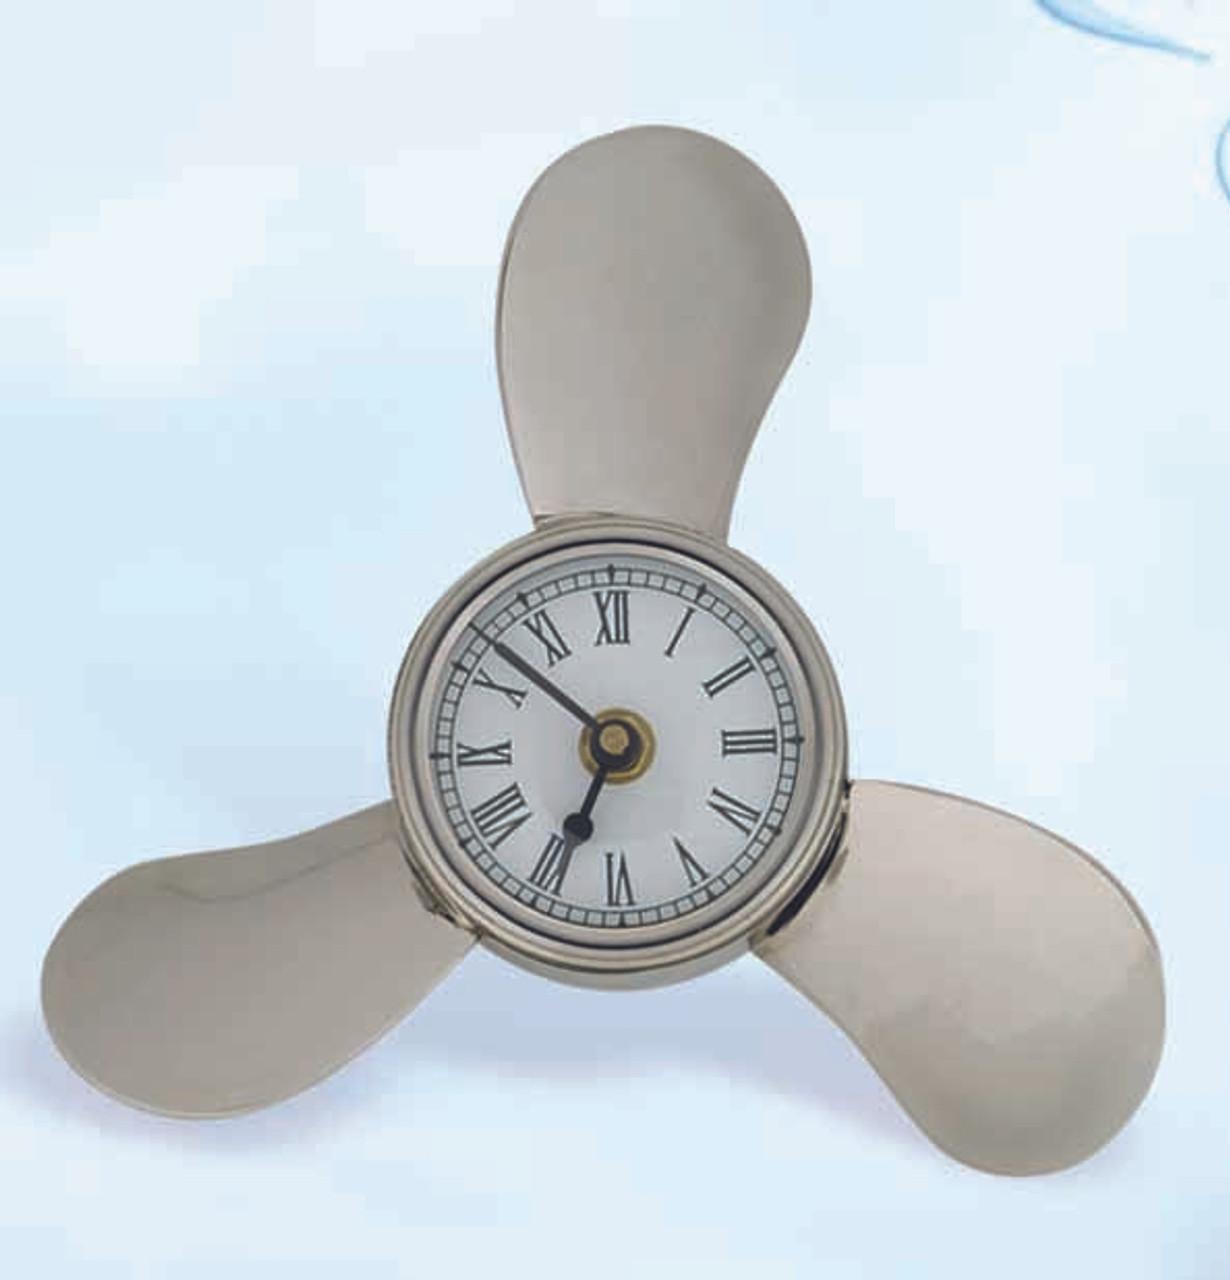 Deluxe Brass Propeller Clock with Nickel Finish